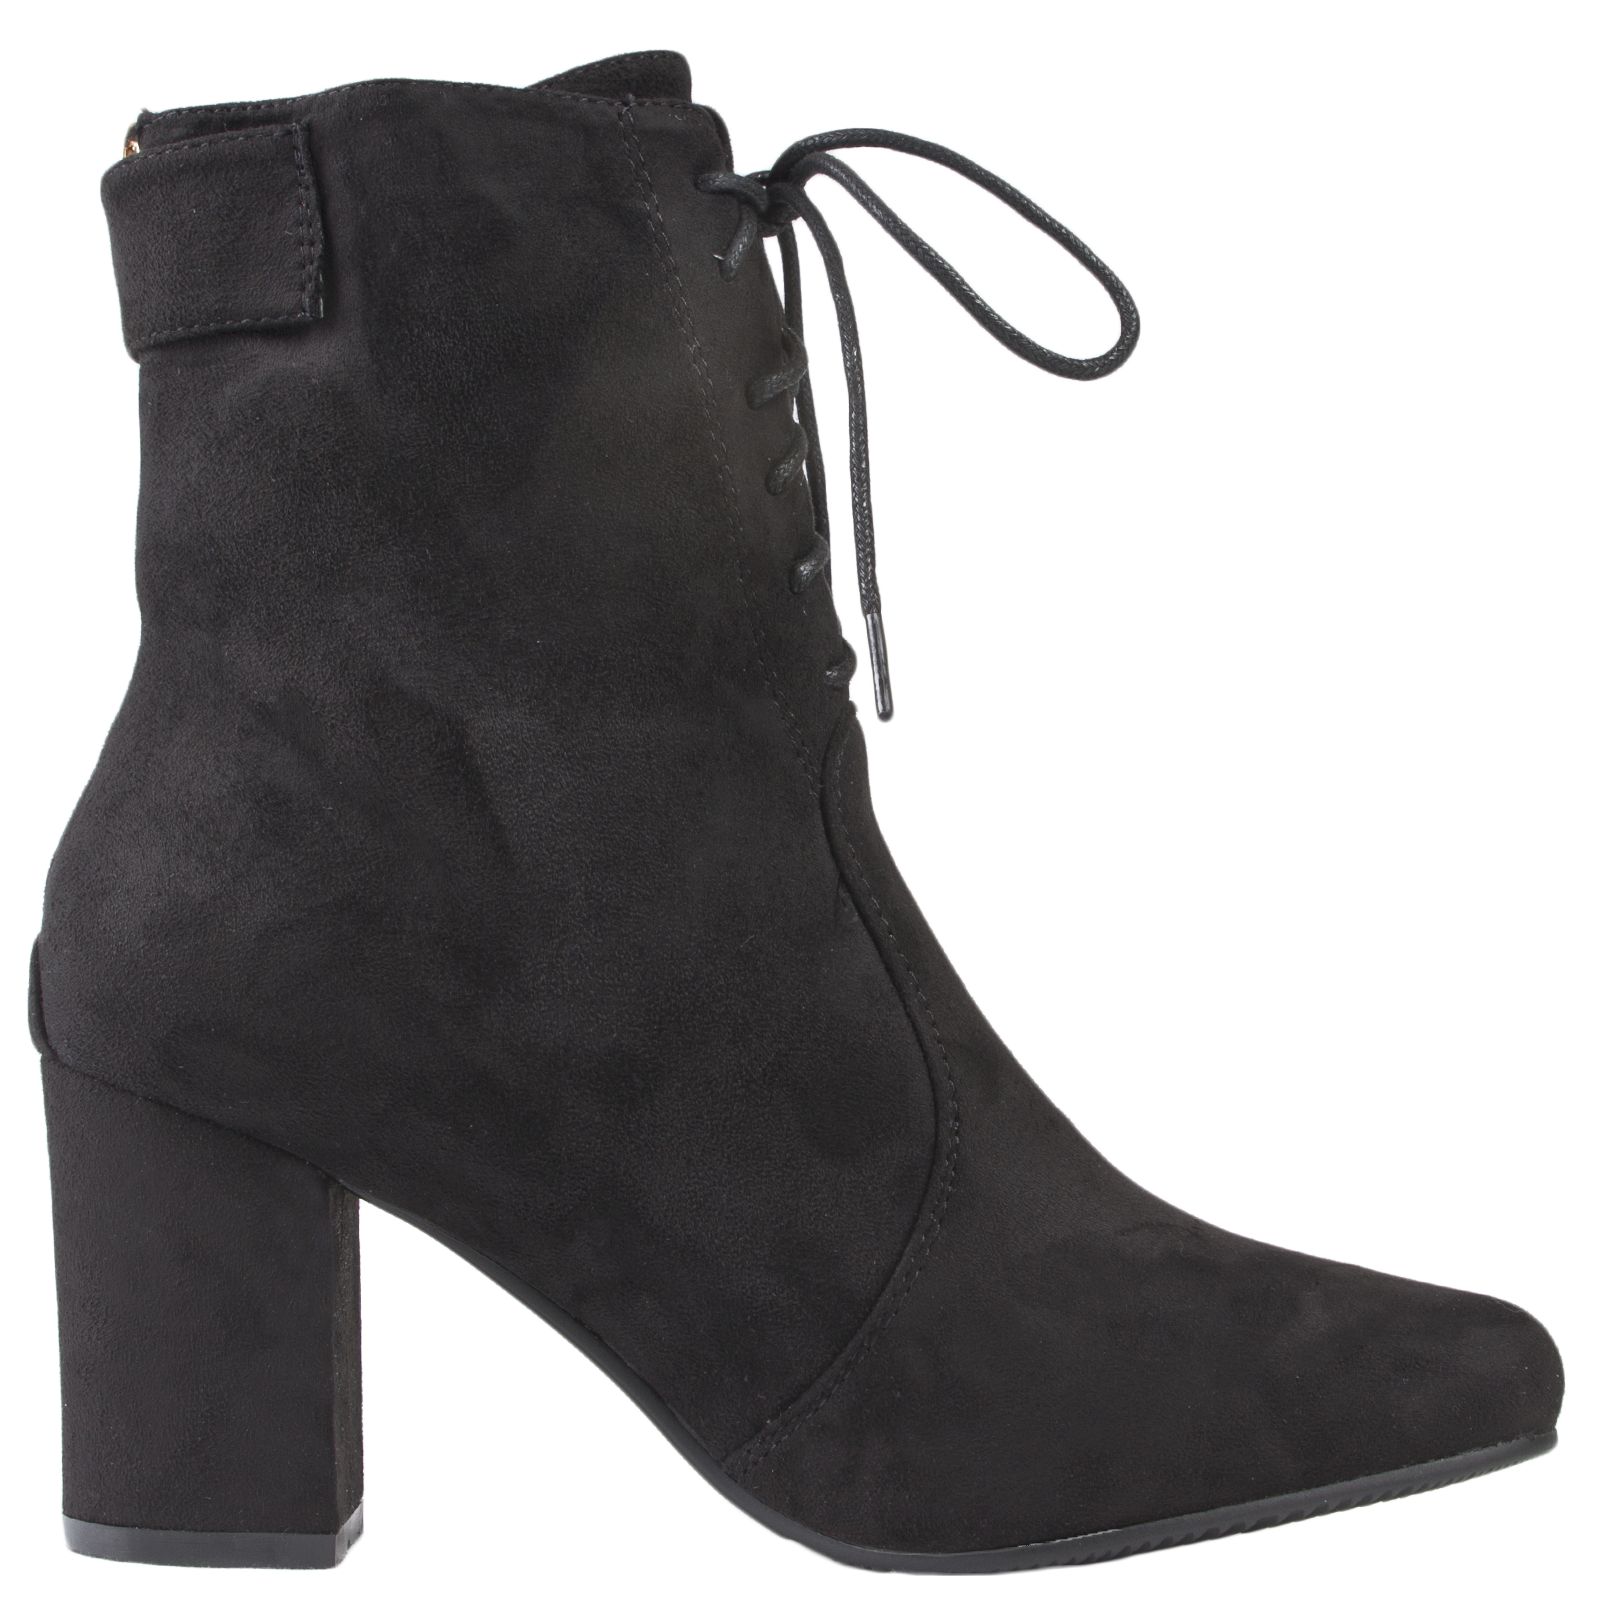 Wonderful Womens Tassel Ankle Boots Chunky Low Block Heel Faux Suede Shoes Size UK 3-8 | EBay